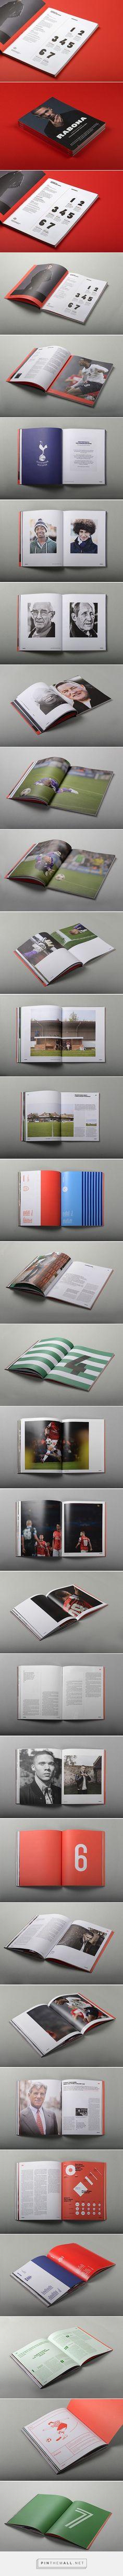 Editorial Design Inspiration: Rabona Magazine | Abduzeedo Design Inspiration